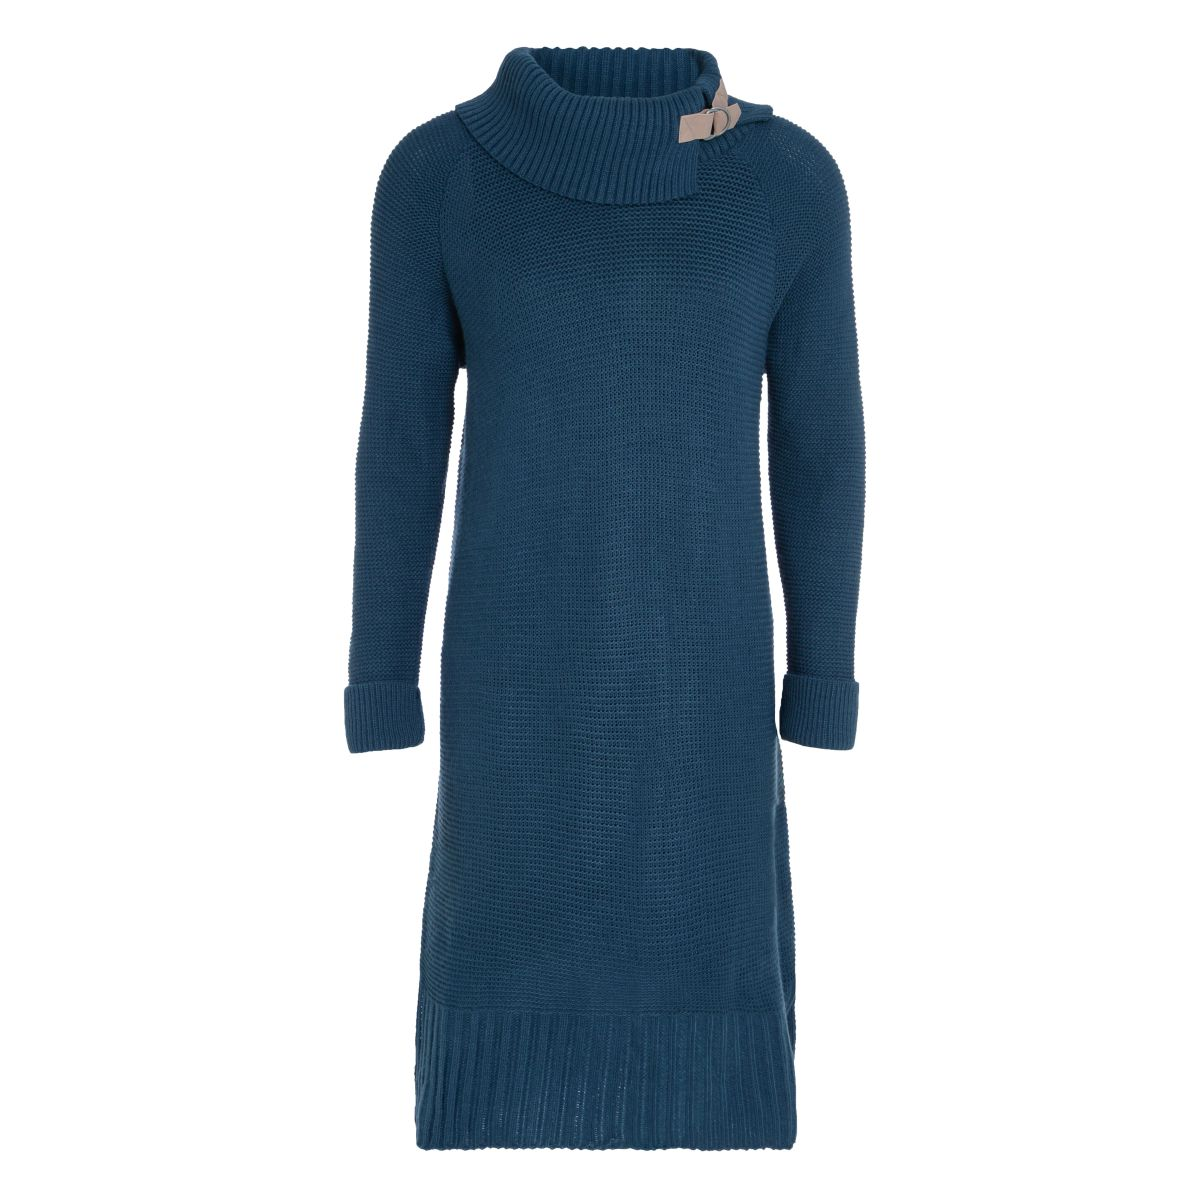 jamie knitted dress petrol 4042